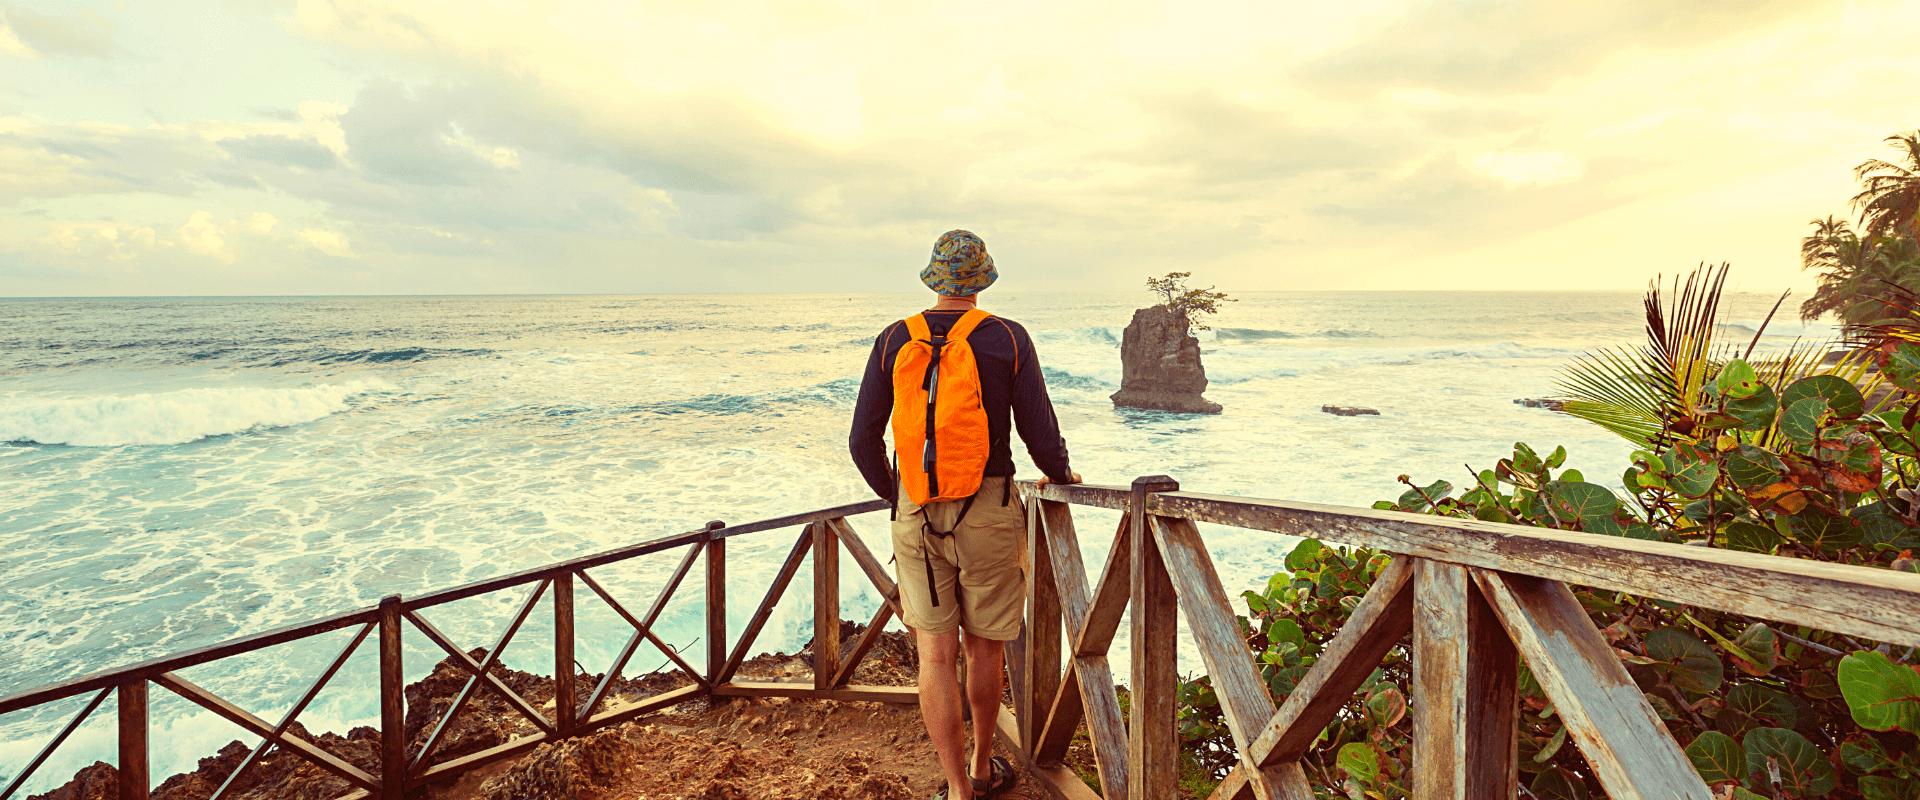 Best of Costa Rica & Nicaragua Tour, Costa Rica